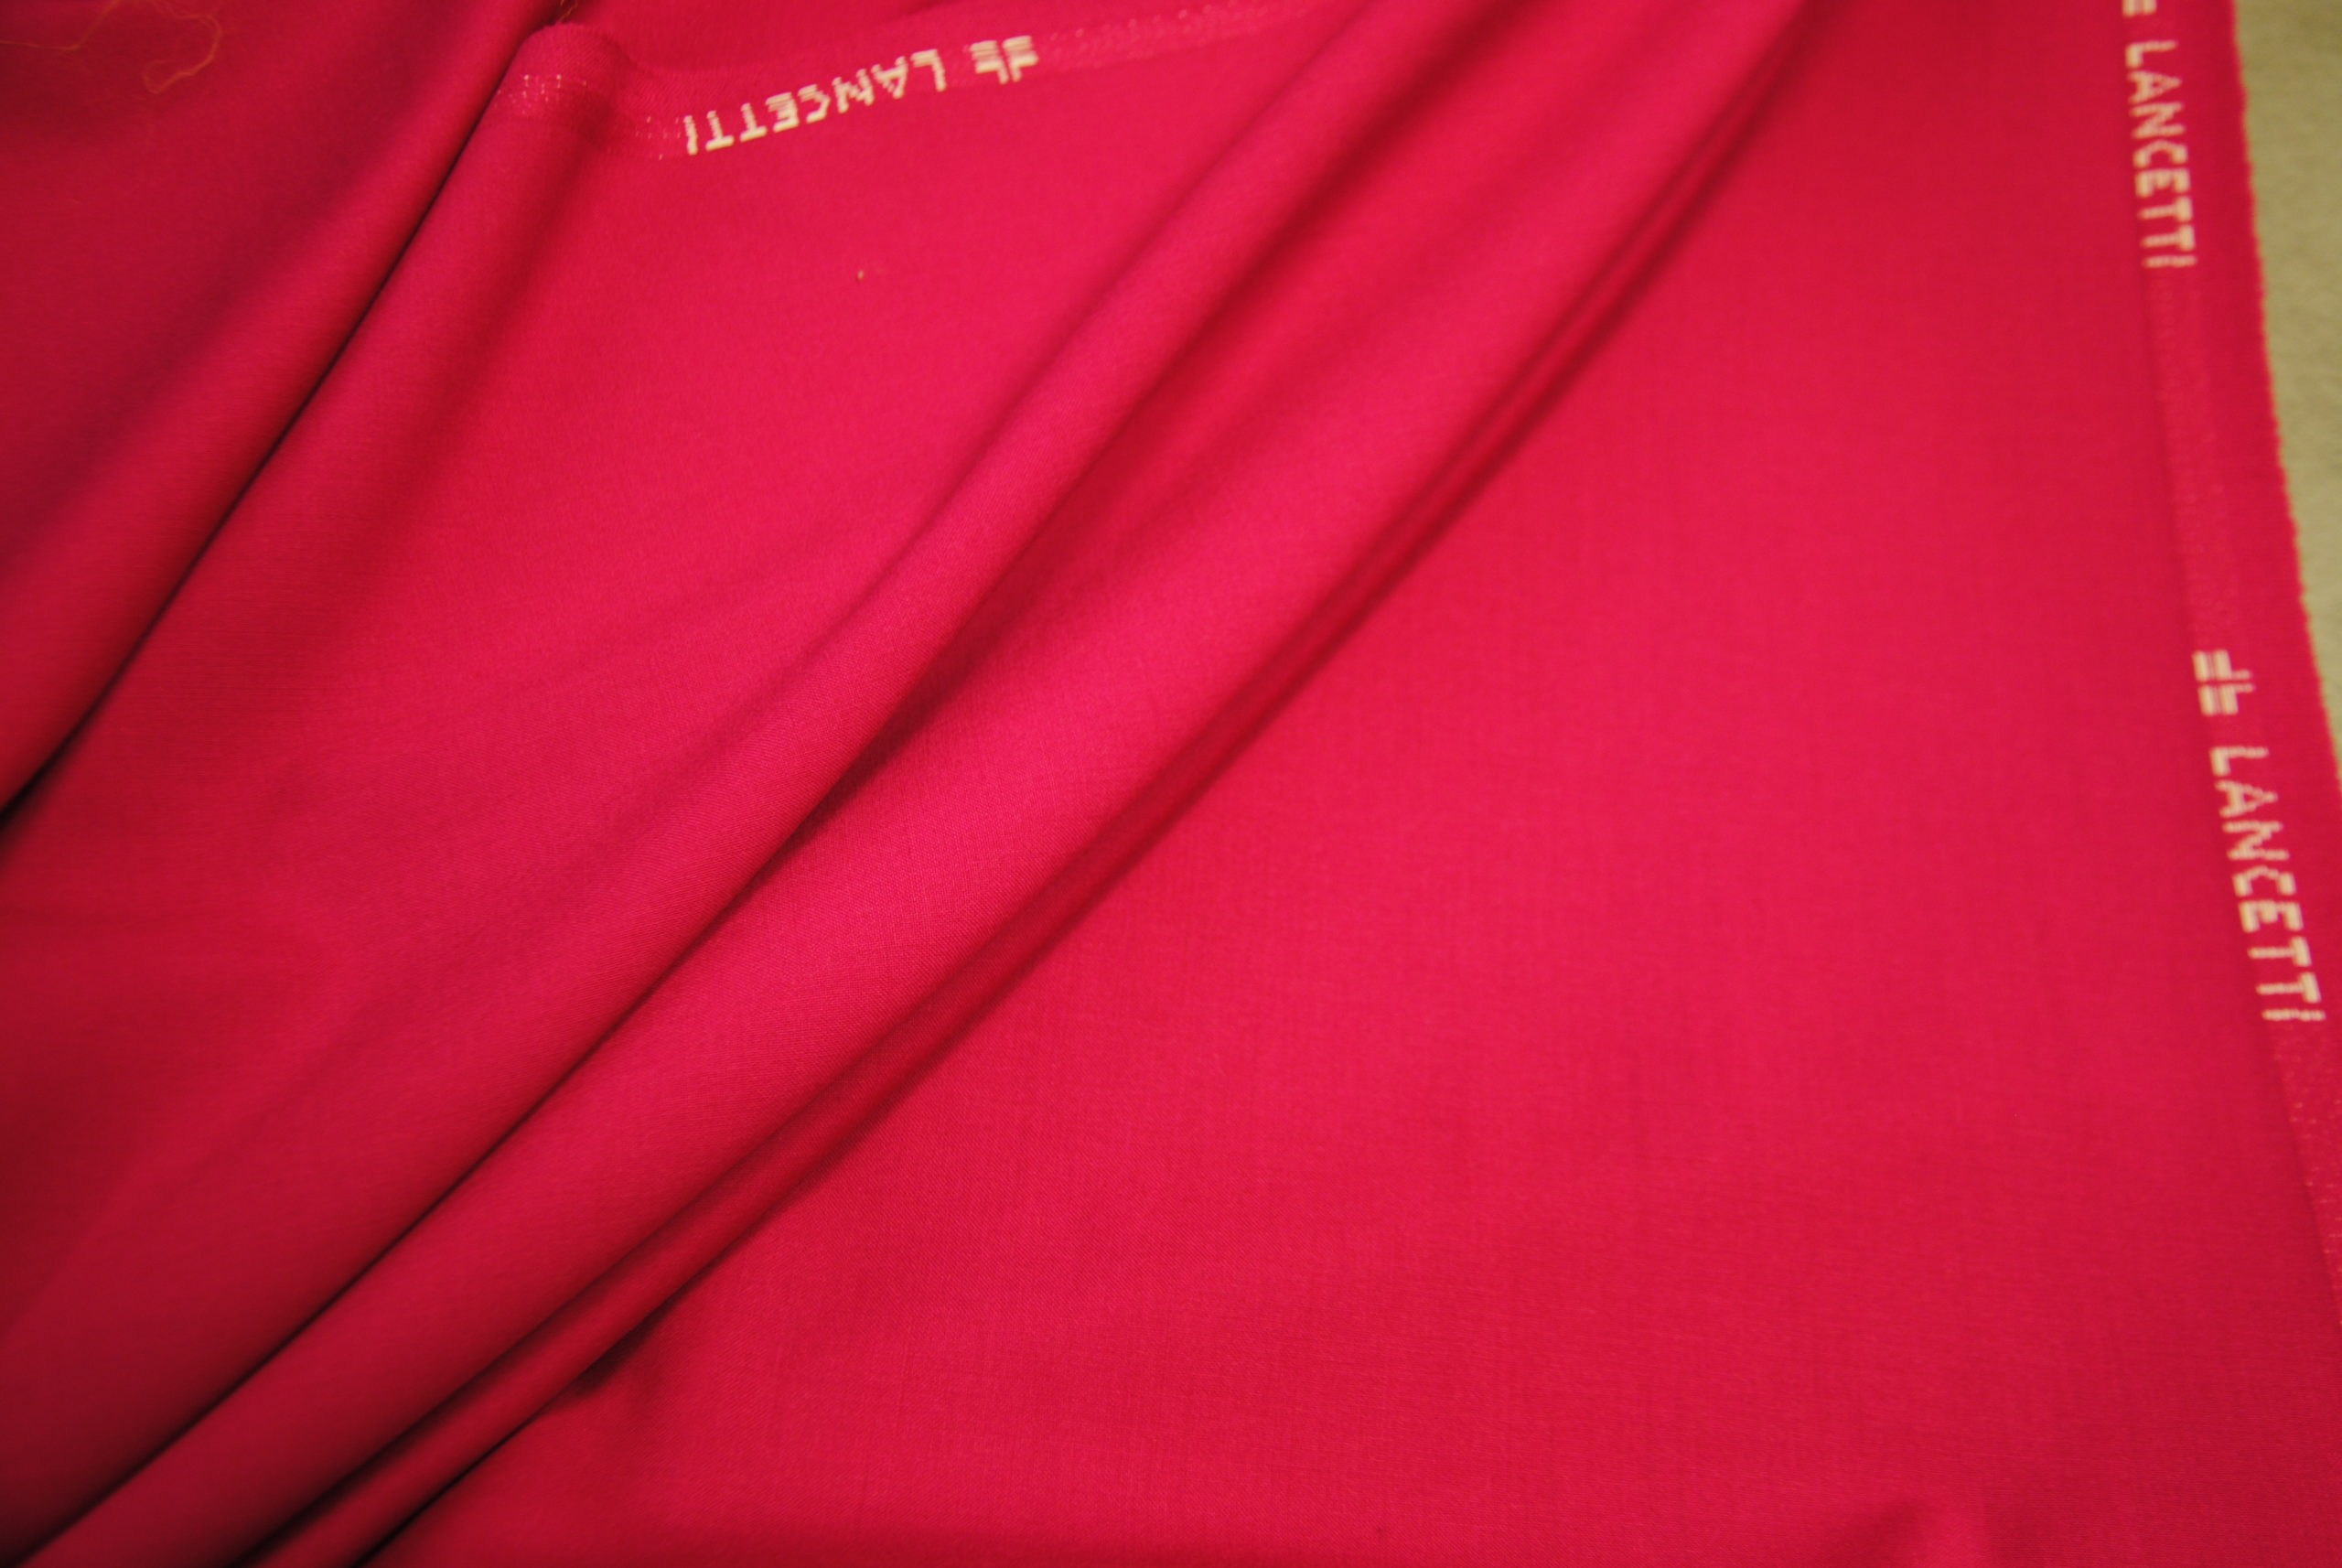 lancetti 3 scaled Lancetti   pura lana fuxia